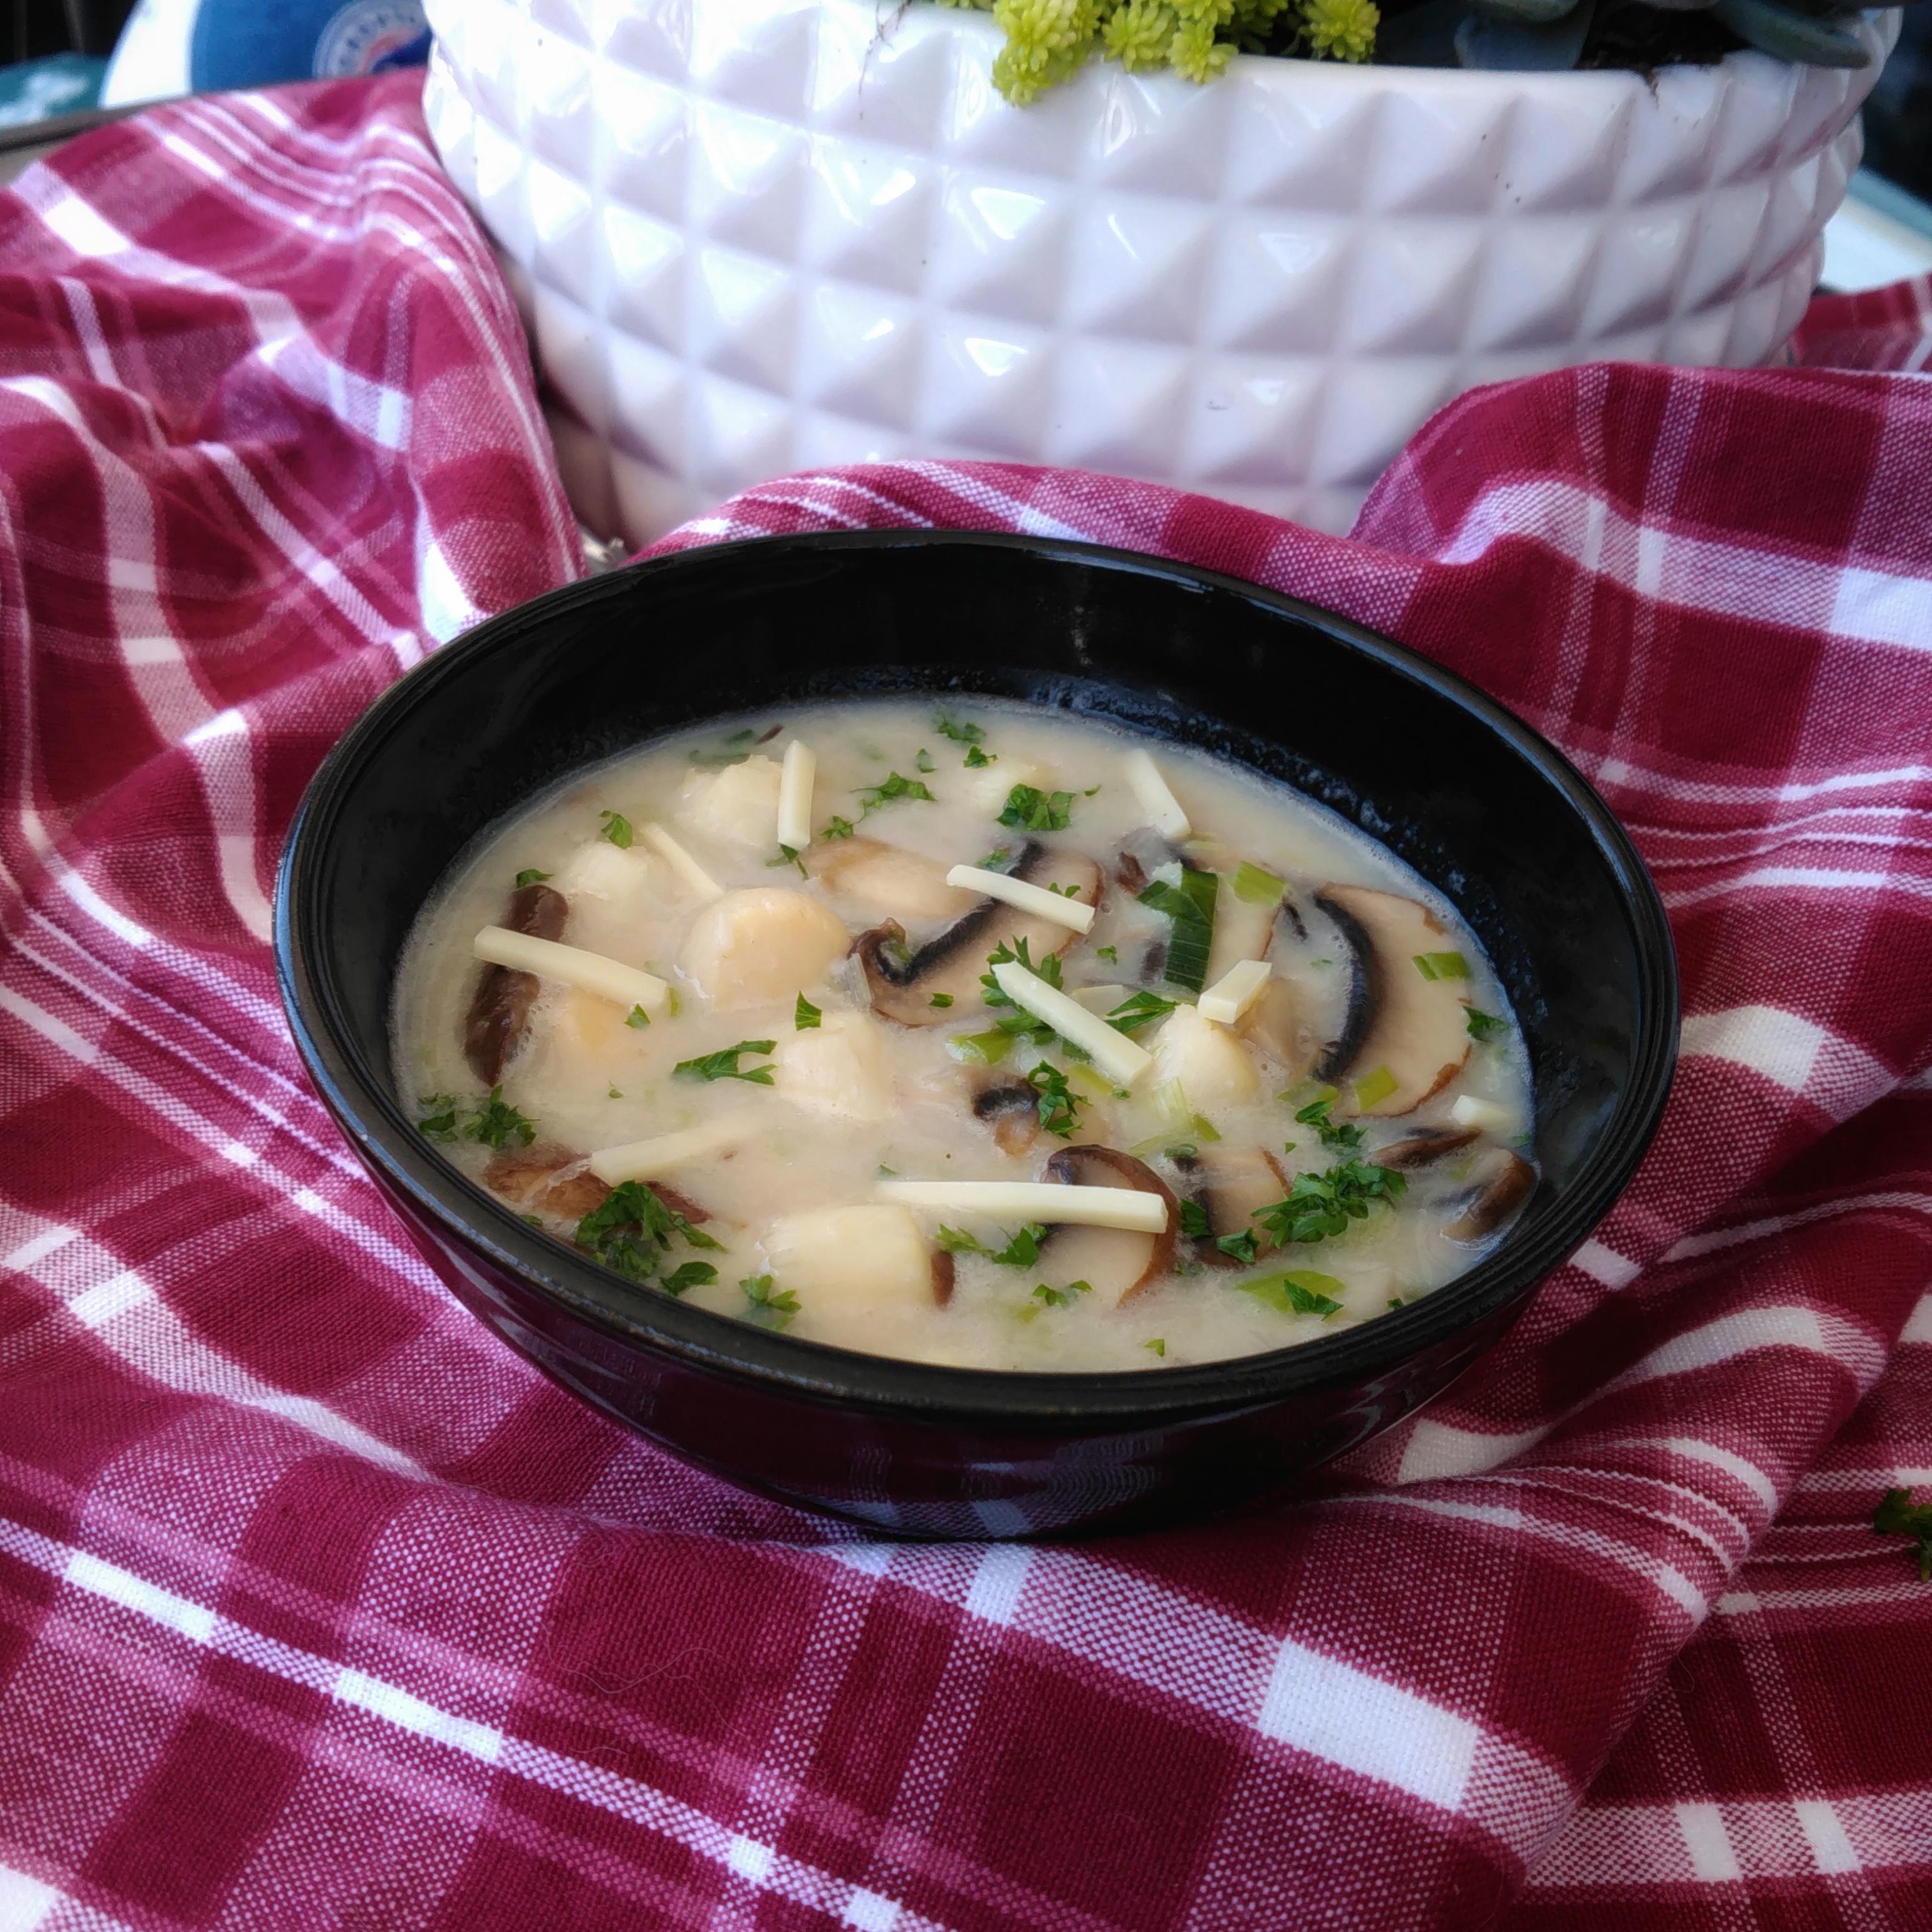 south carolina she crab soup recipe